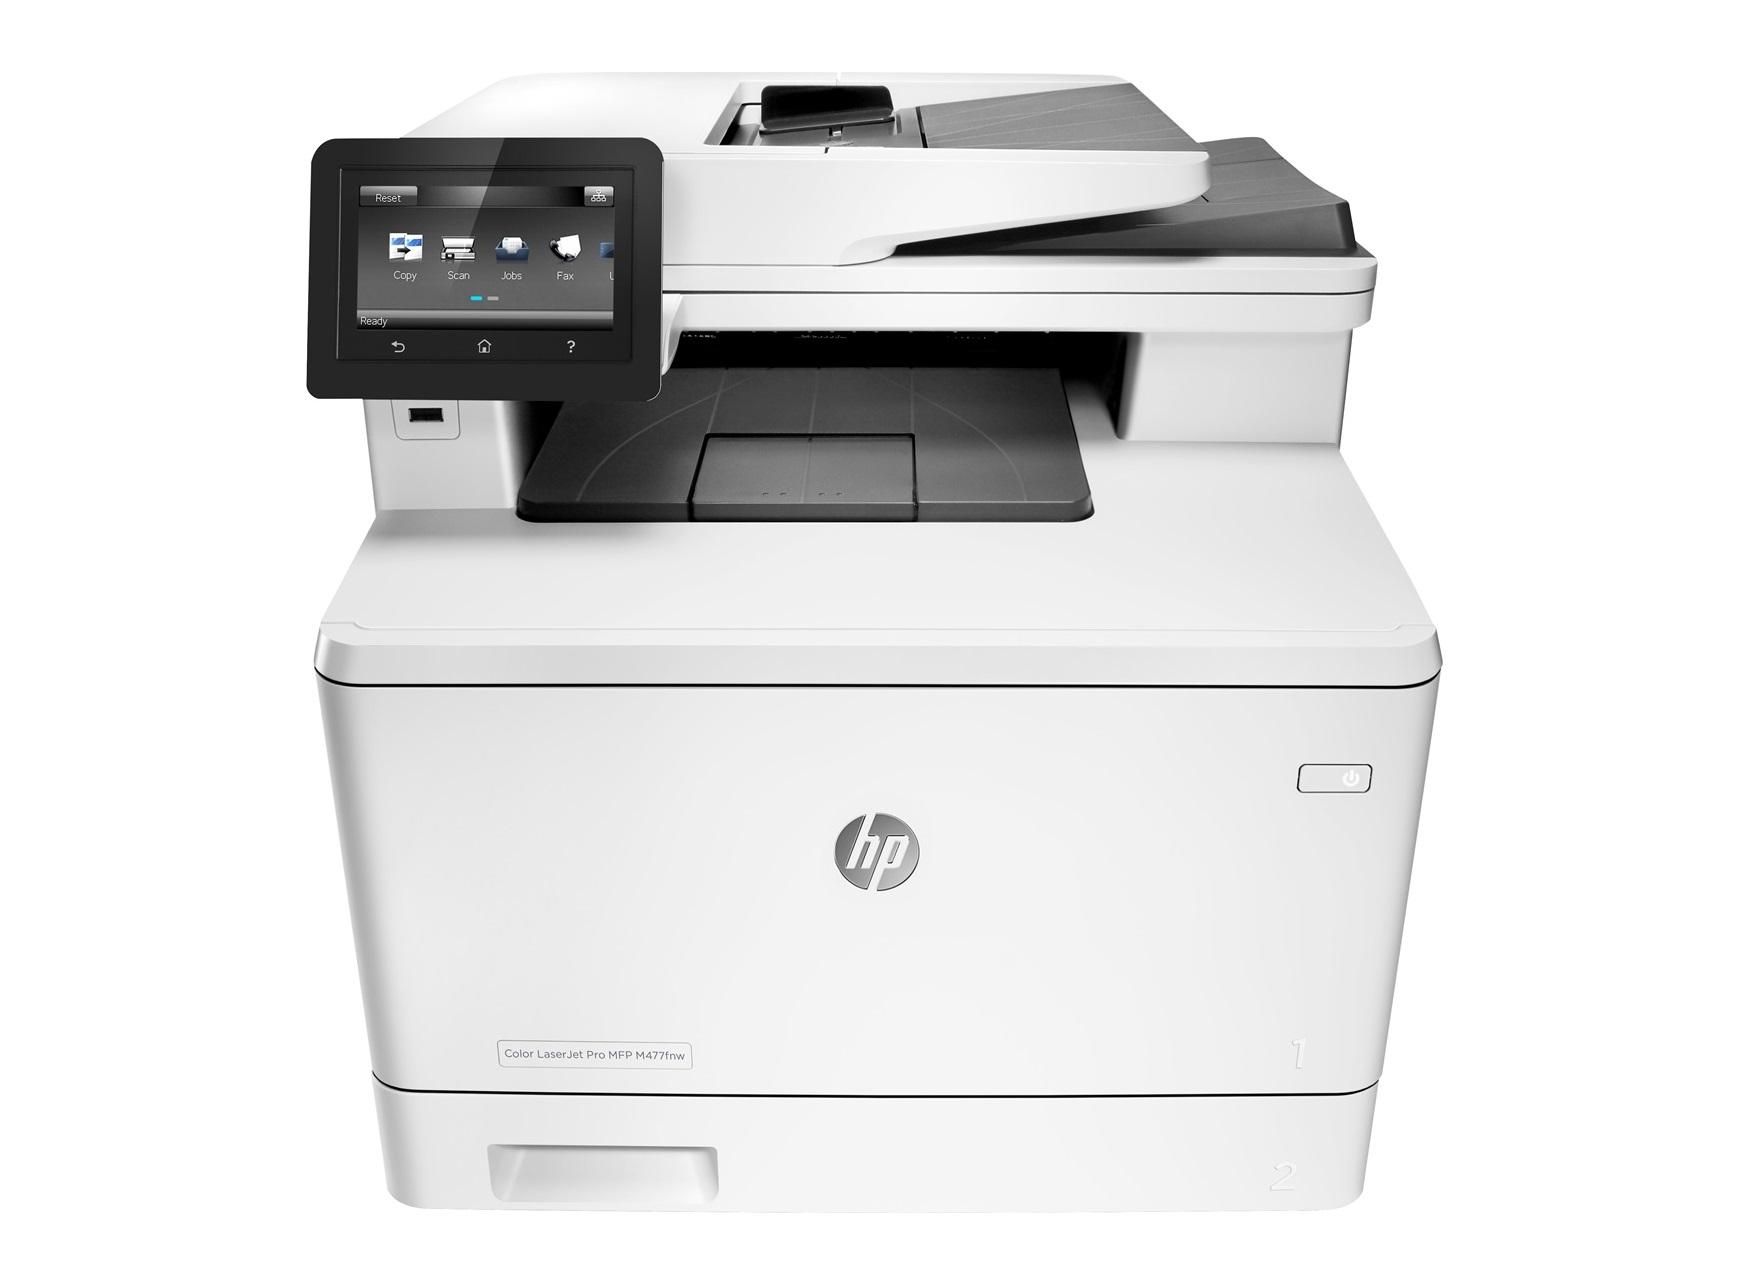 Принтер HP Color LaserJet Pro MFP M477fnw